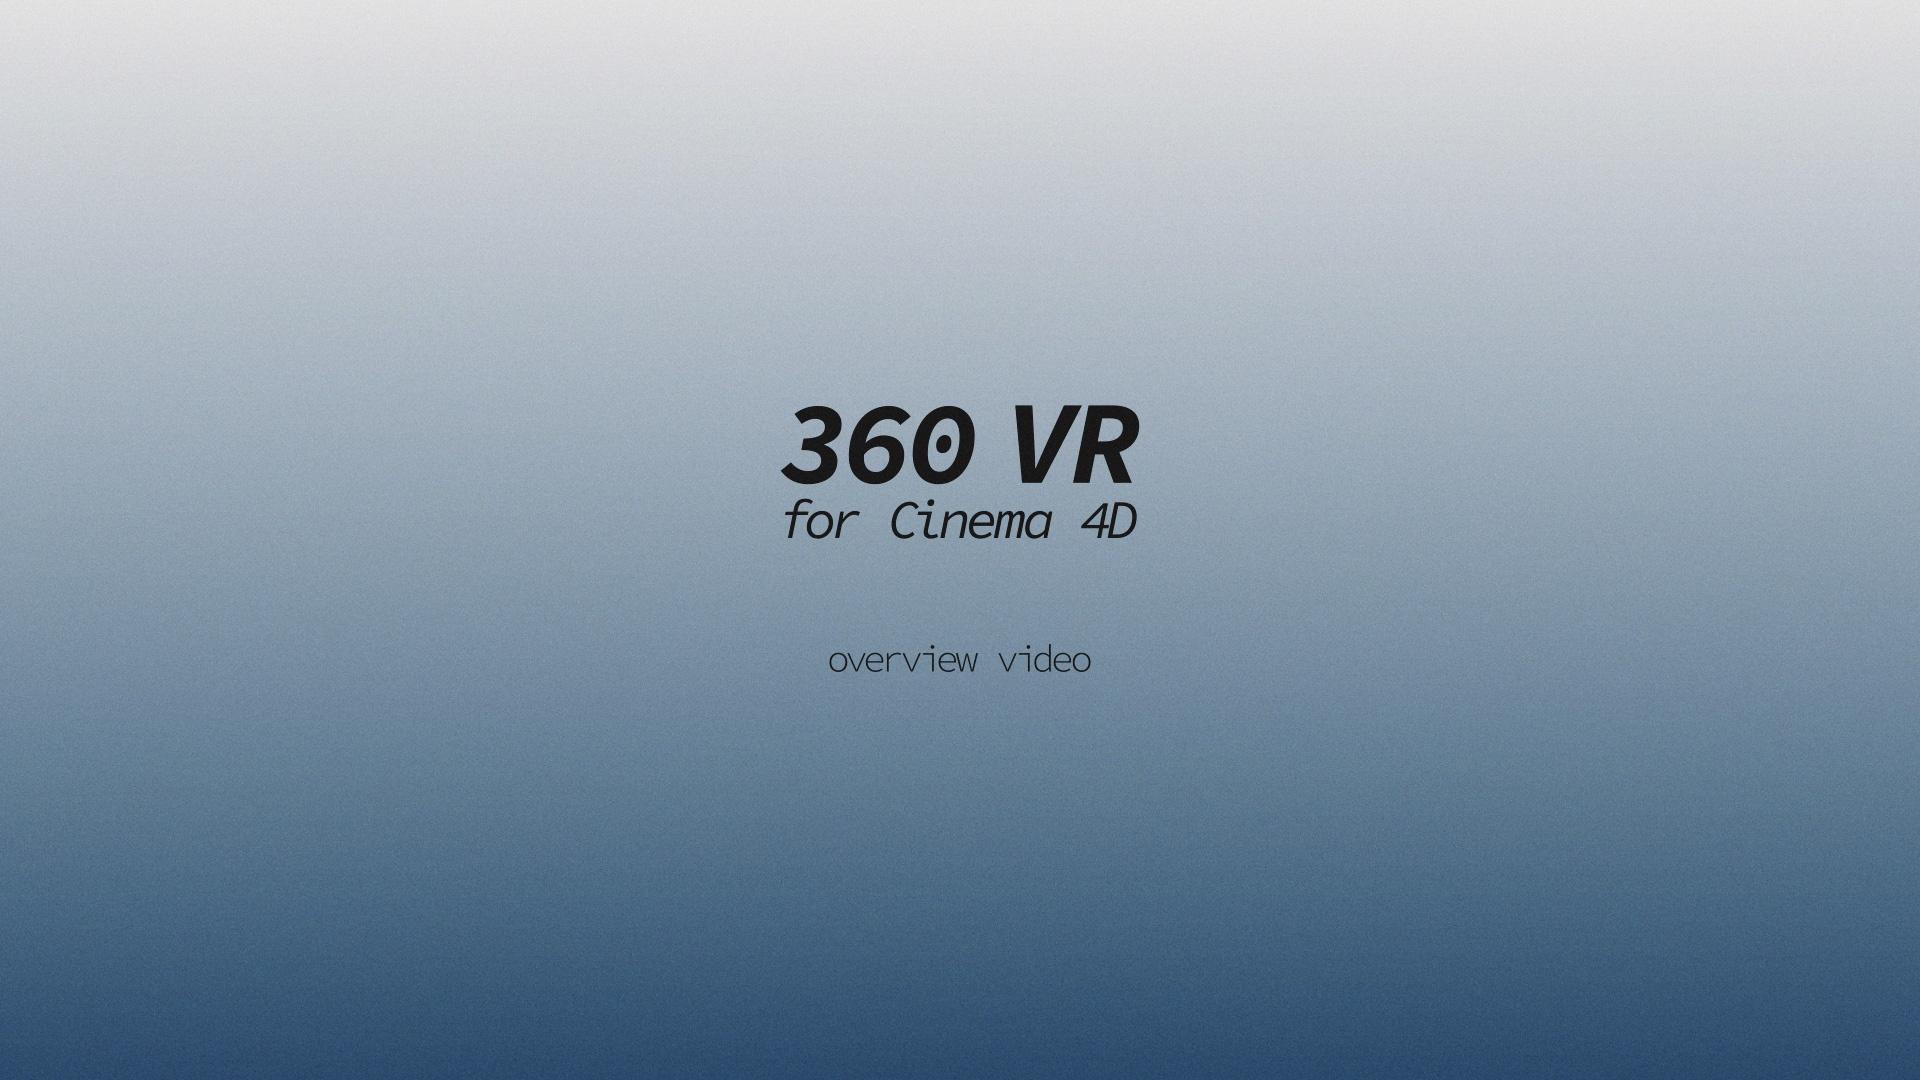 360 Vr For Cinema 4d Leupsi